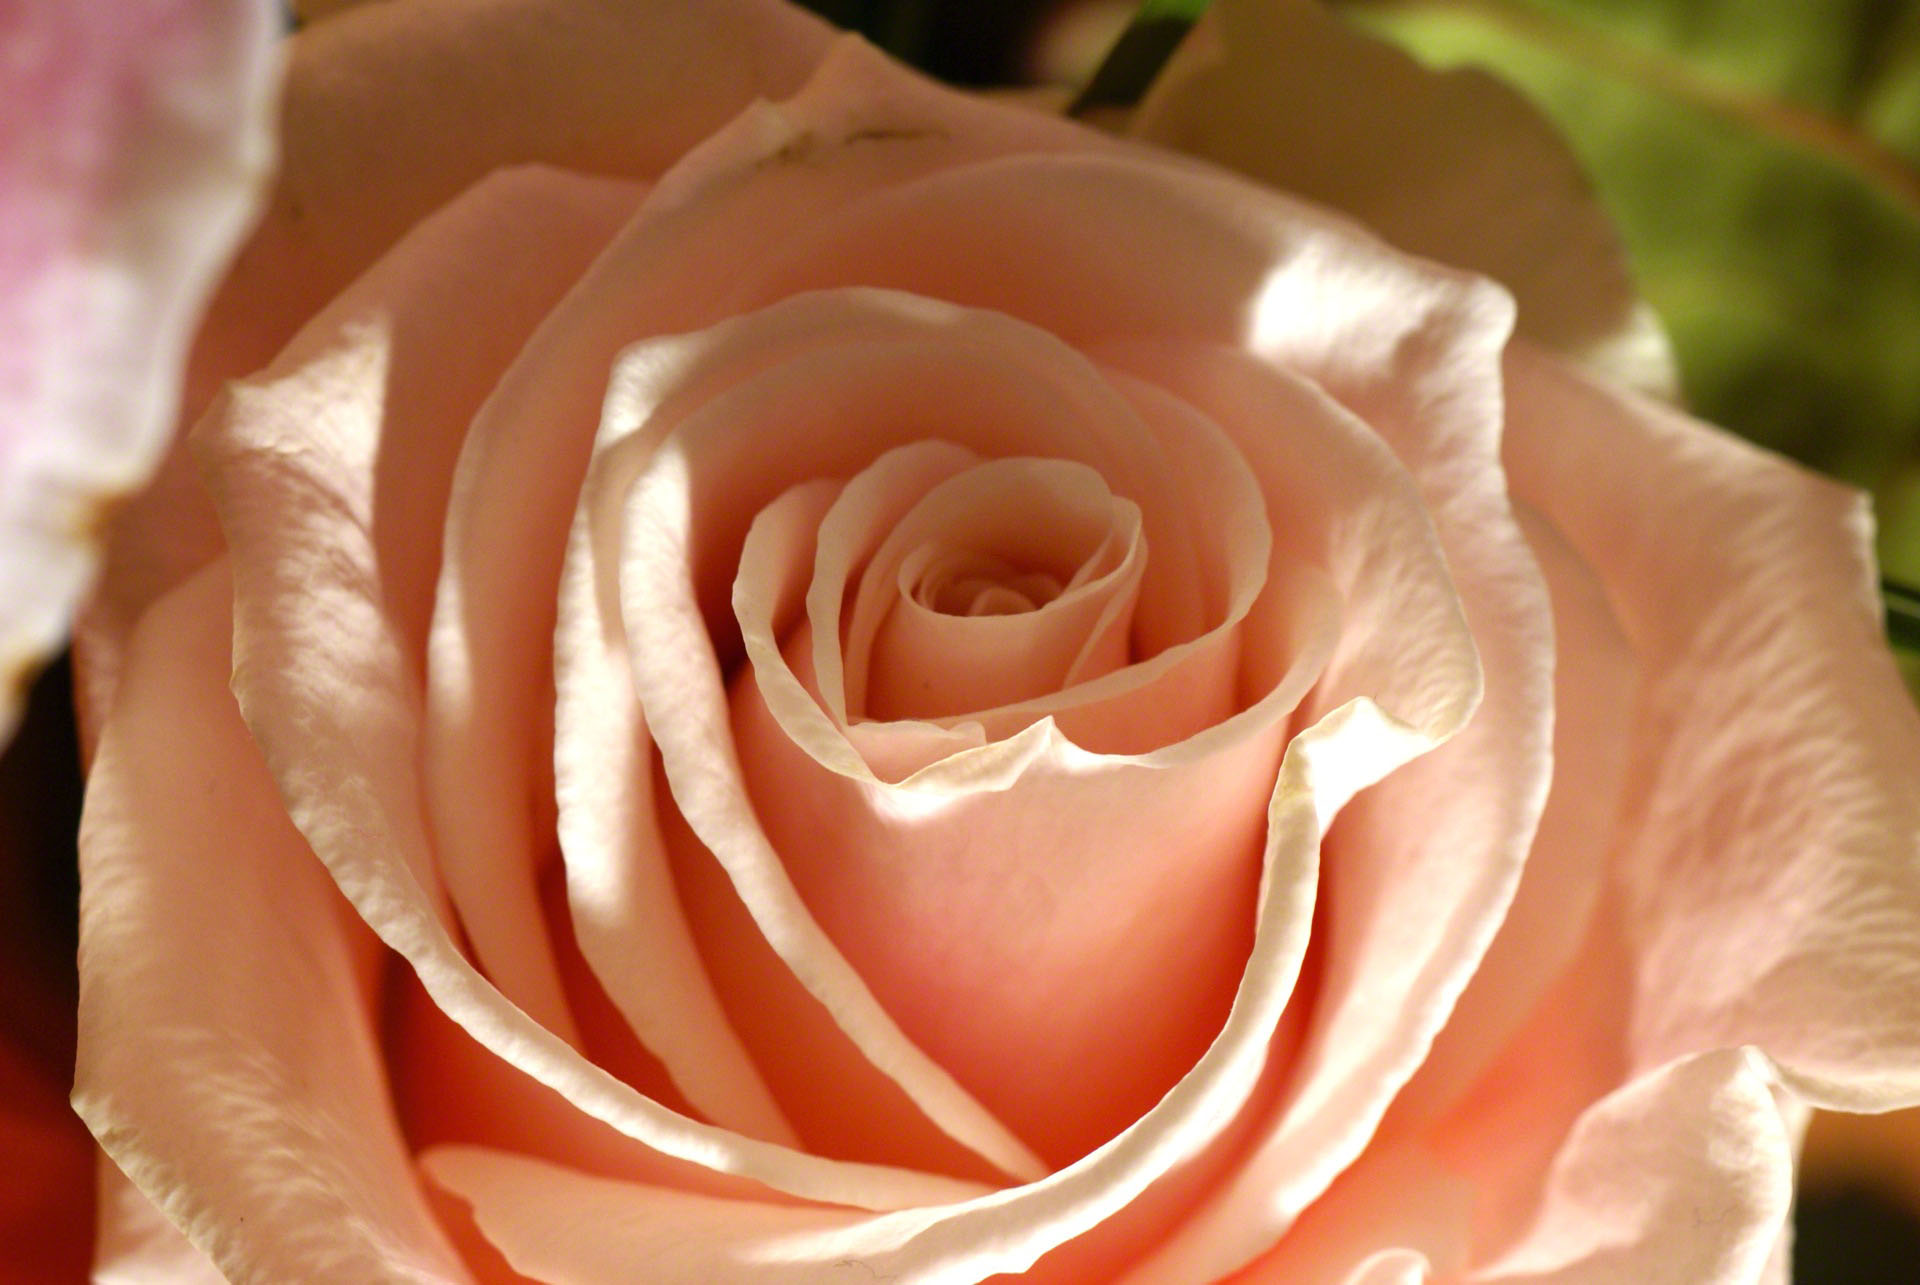 http://www.fabiovisentin.com/photography/photo/12/peach-rose-macro-dsc01131.jpg